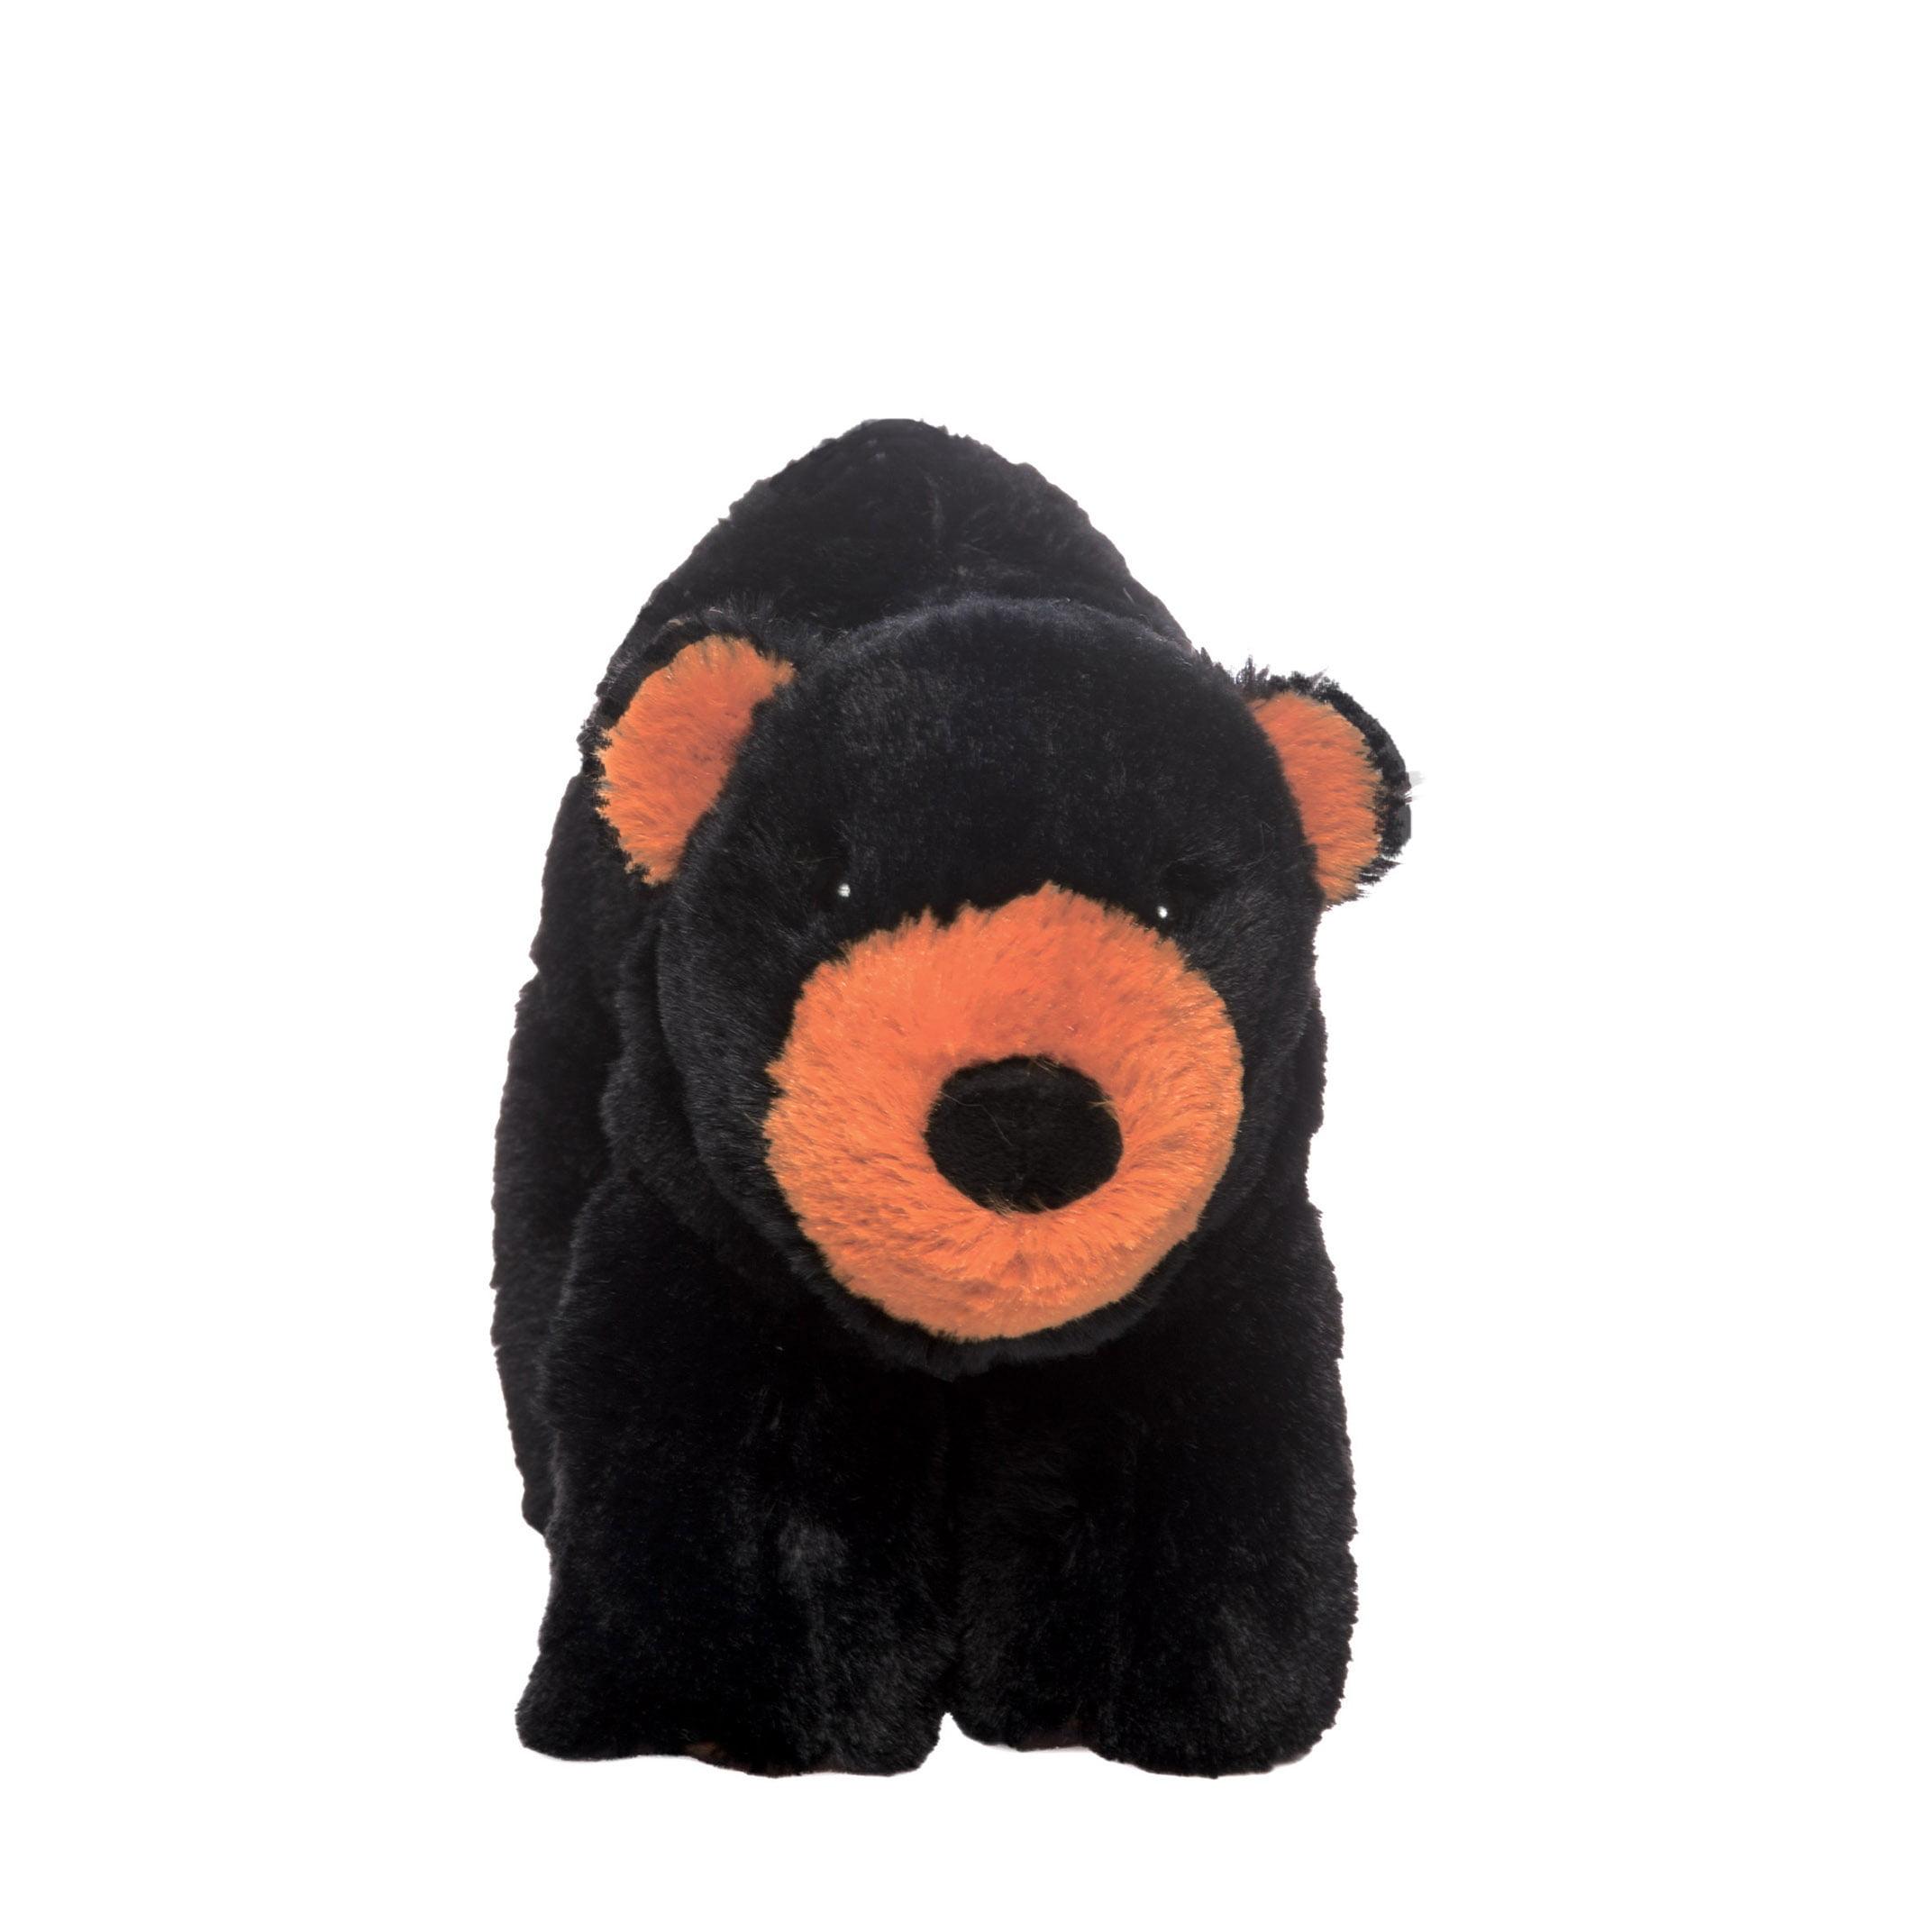 "Manhattan Toy Voyagers Harley Black Bear 6"" Plush Toy by Manhattan Toy"